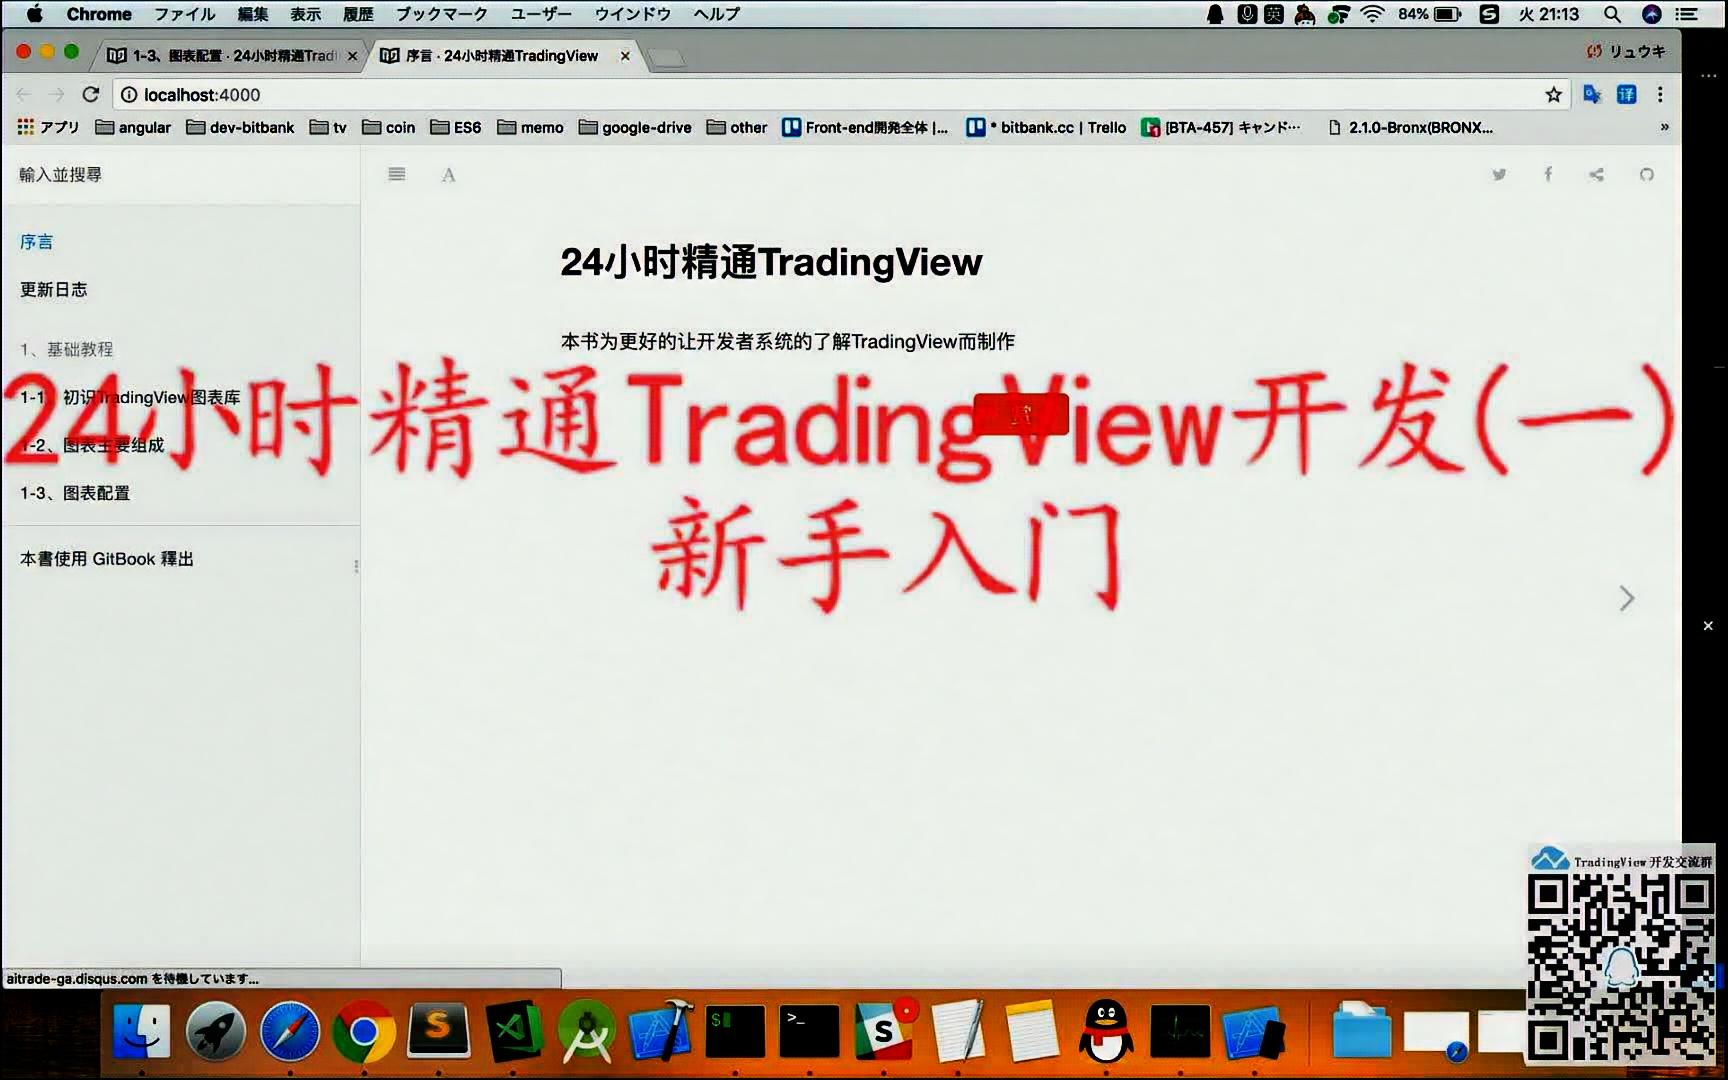 Angular2 入門 24小时精通tradingview开发(一) 新手入门- 52donghua